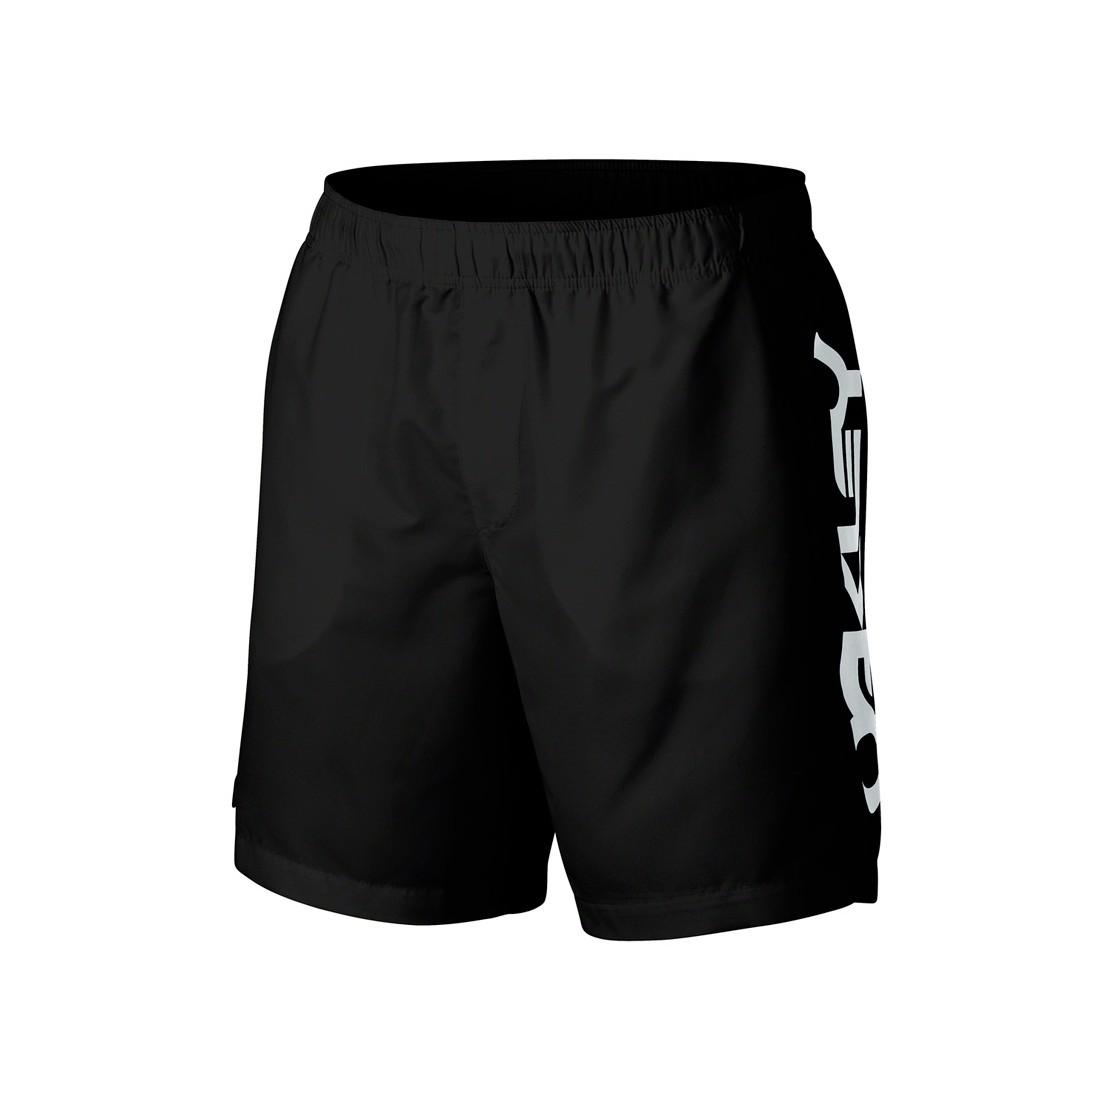 Volley Hop Bañador Comprar Short Negro Oakley 8NnPZk0wXO